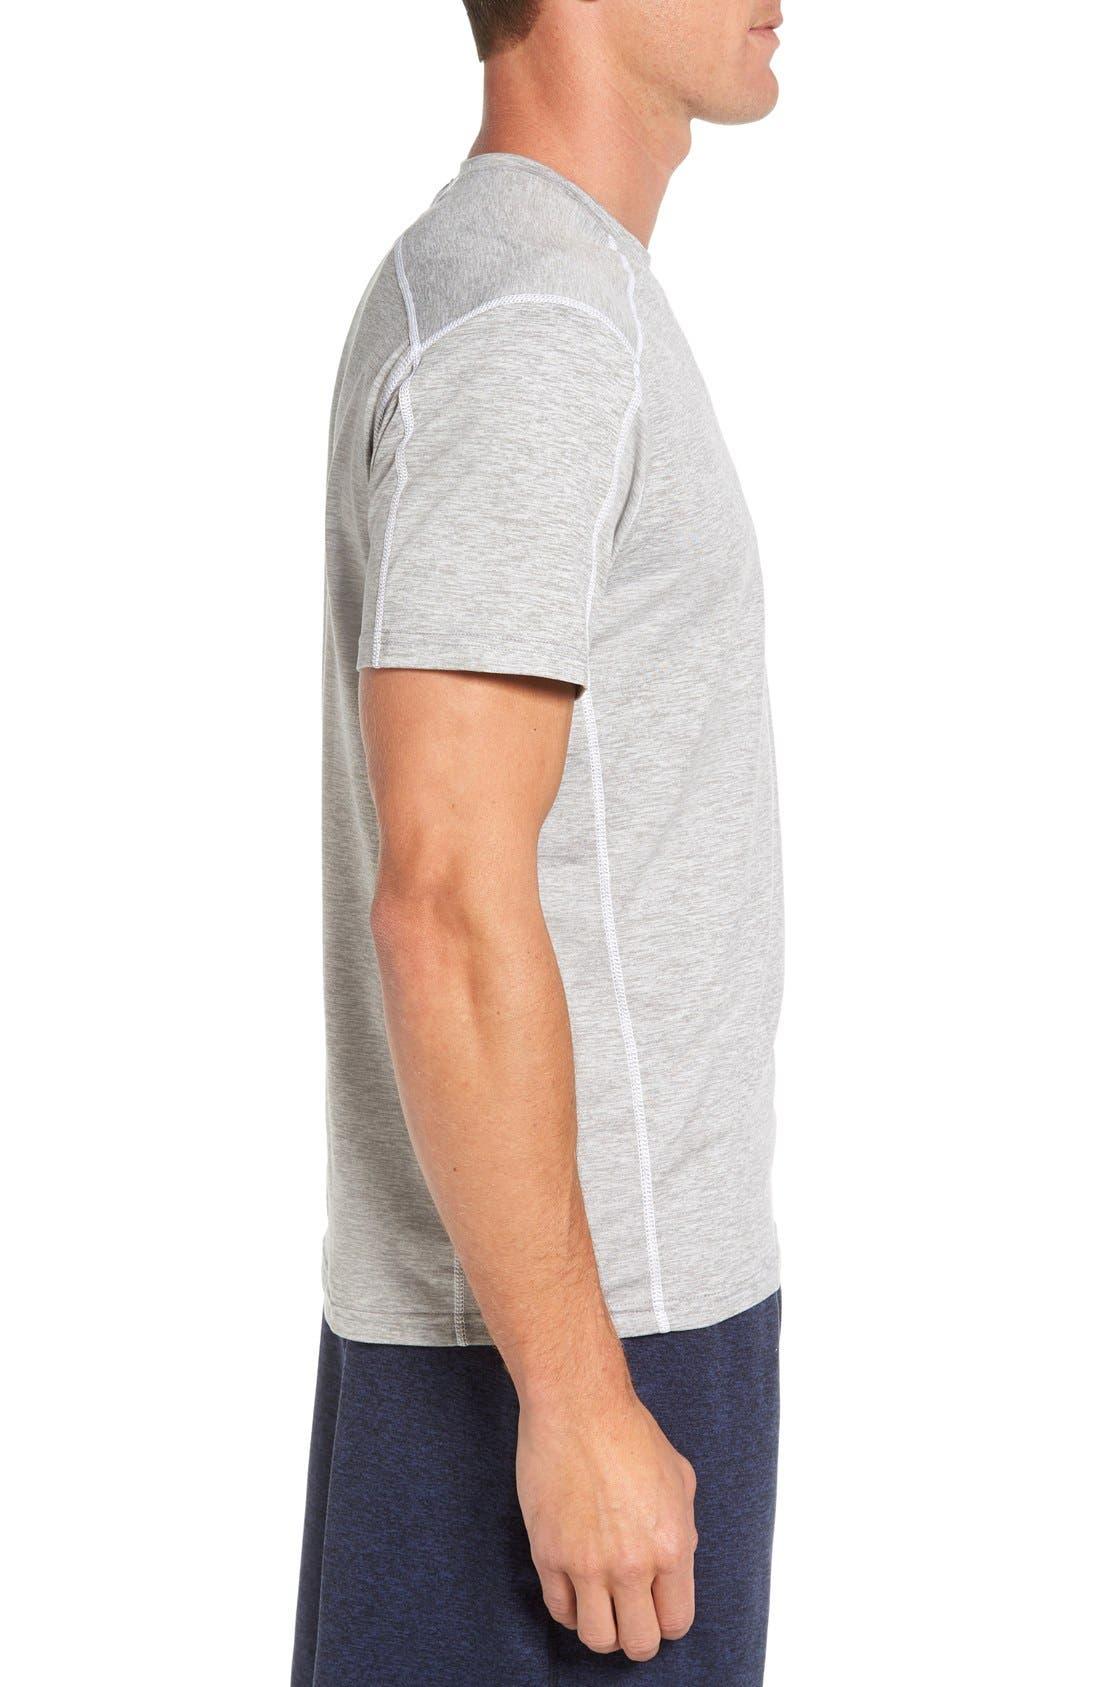 'Cooldown' Moisture Wicking Training T-Shirt,                             Alternate thumbnail 3, color,                             030